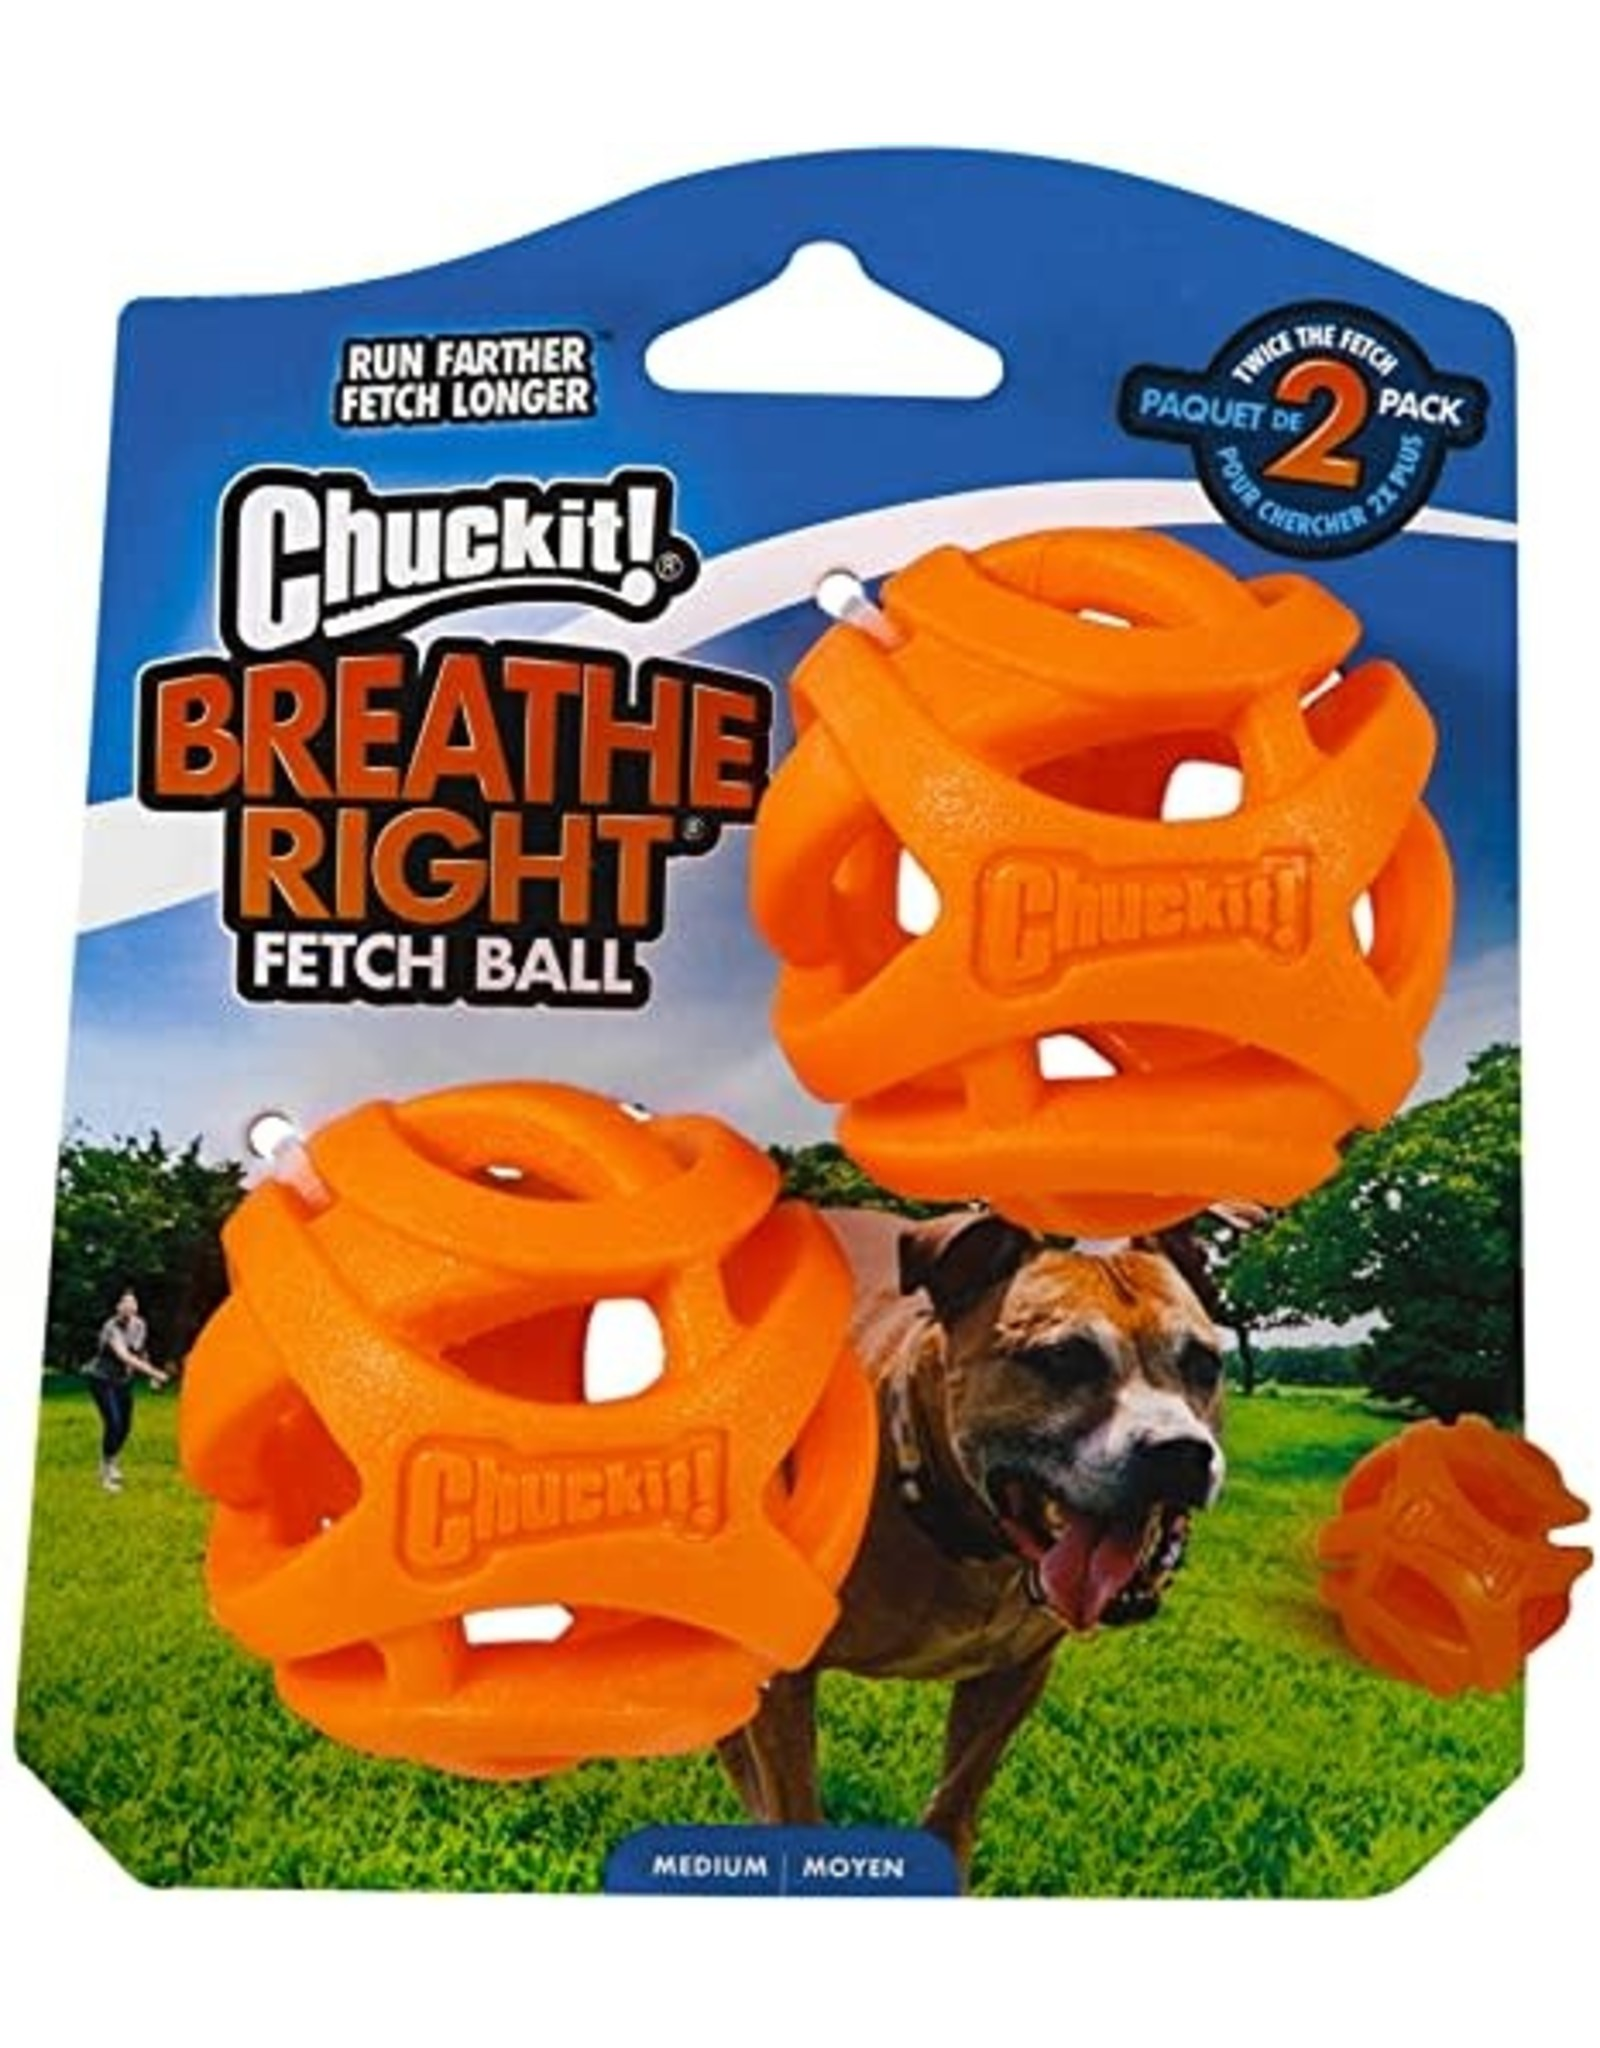 Chuckit! Chuckit! Breathe Right Fetch Ball Dog Toy Medium 2pk